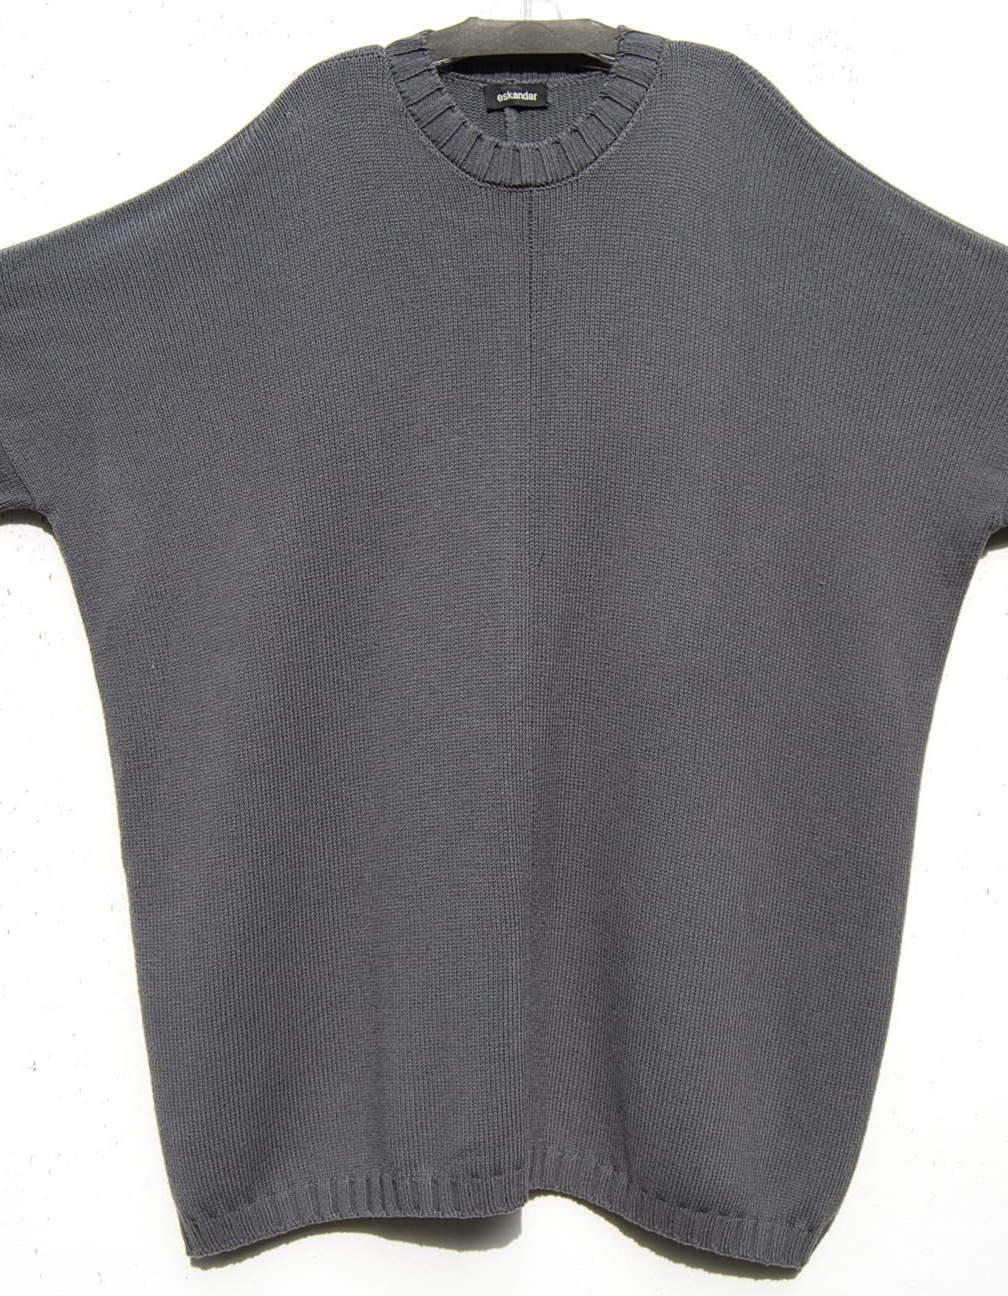 NEW Eskandar CHARCOAL Handloomed Handloomed Handloomed 52% Merino 48% Cotton 34  Long Sweater  1490 bd0298